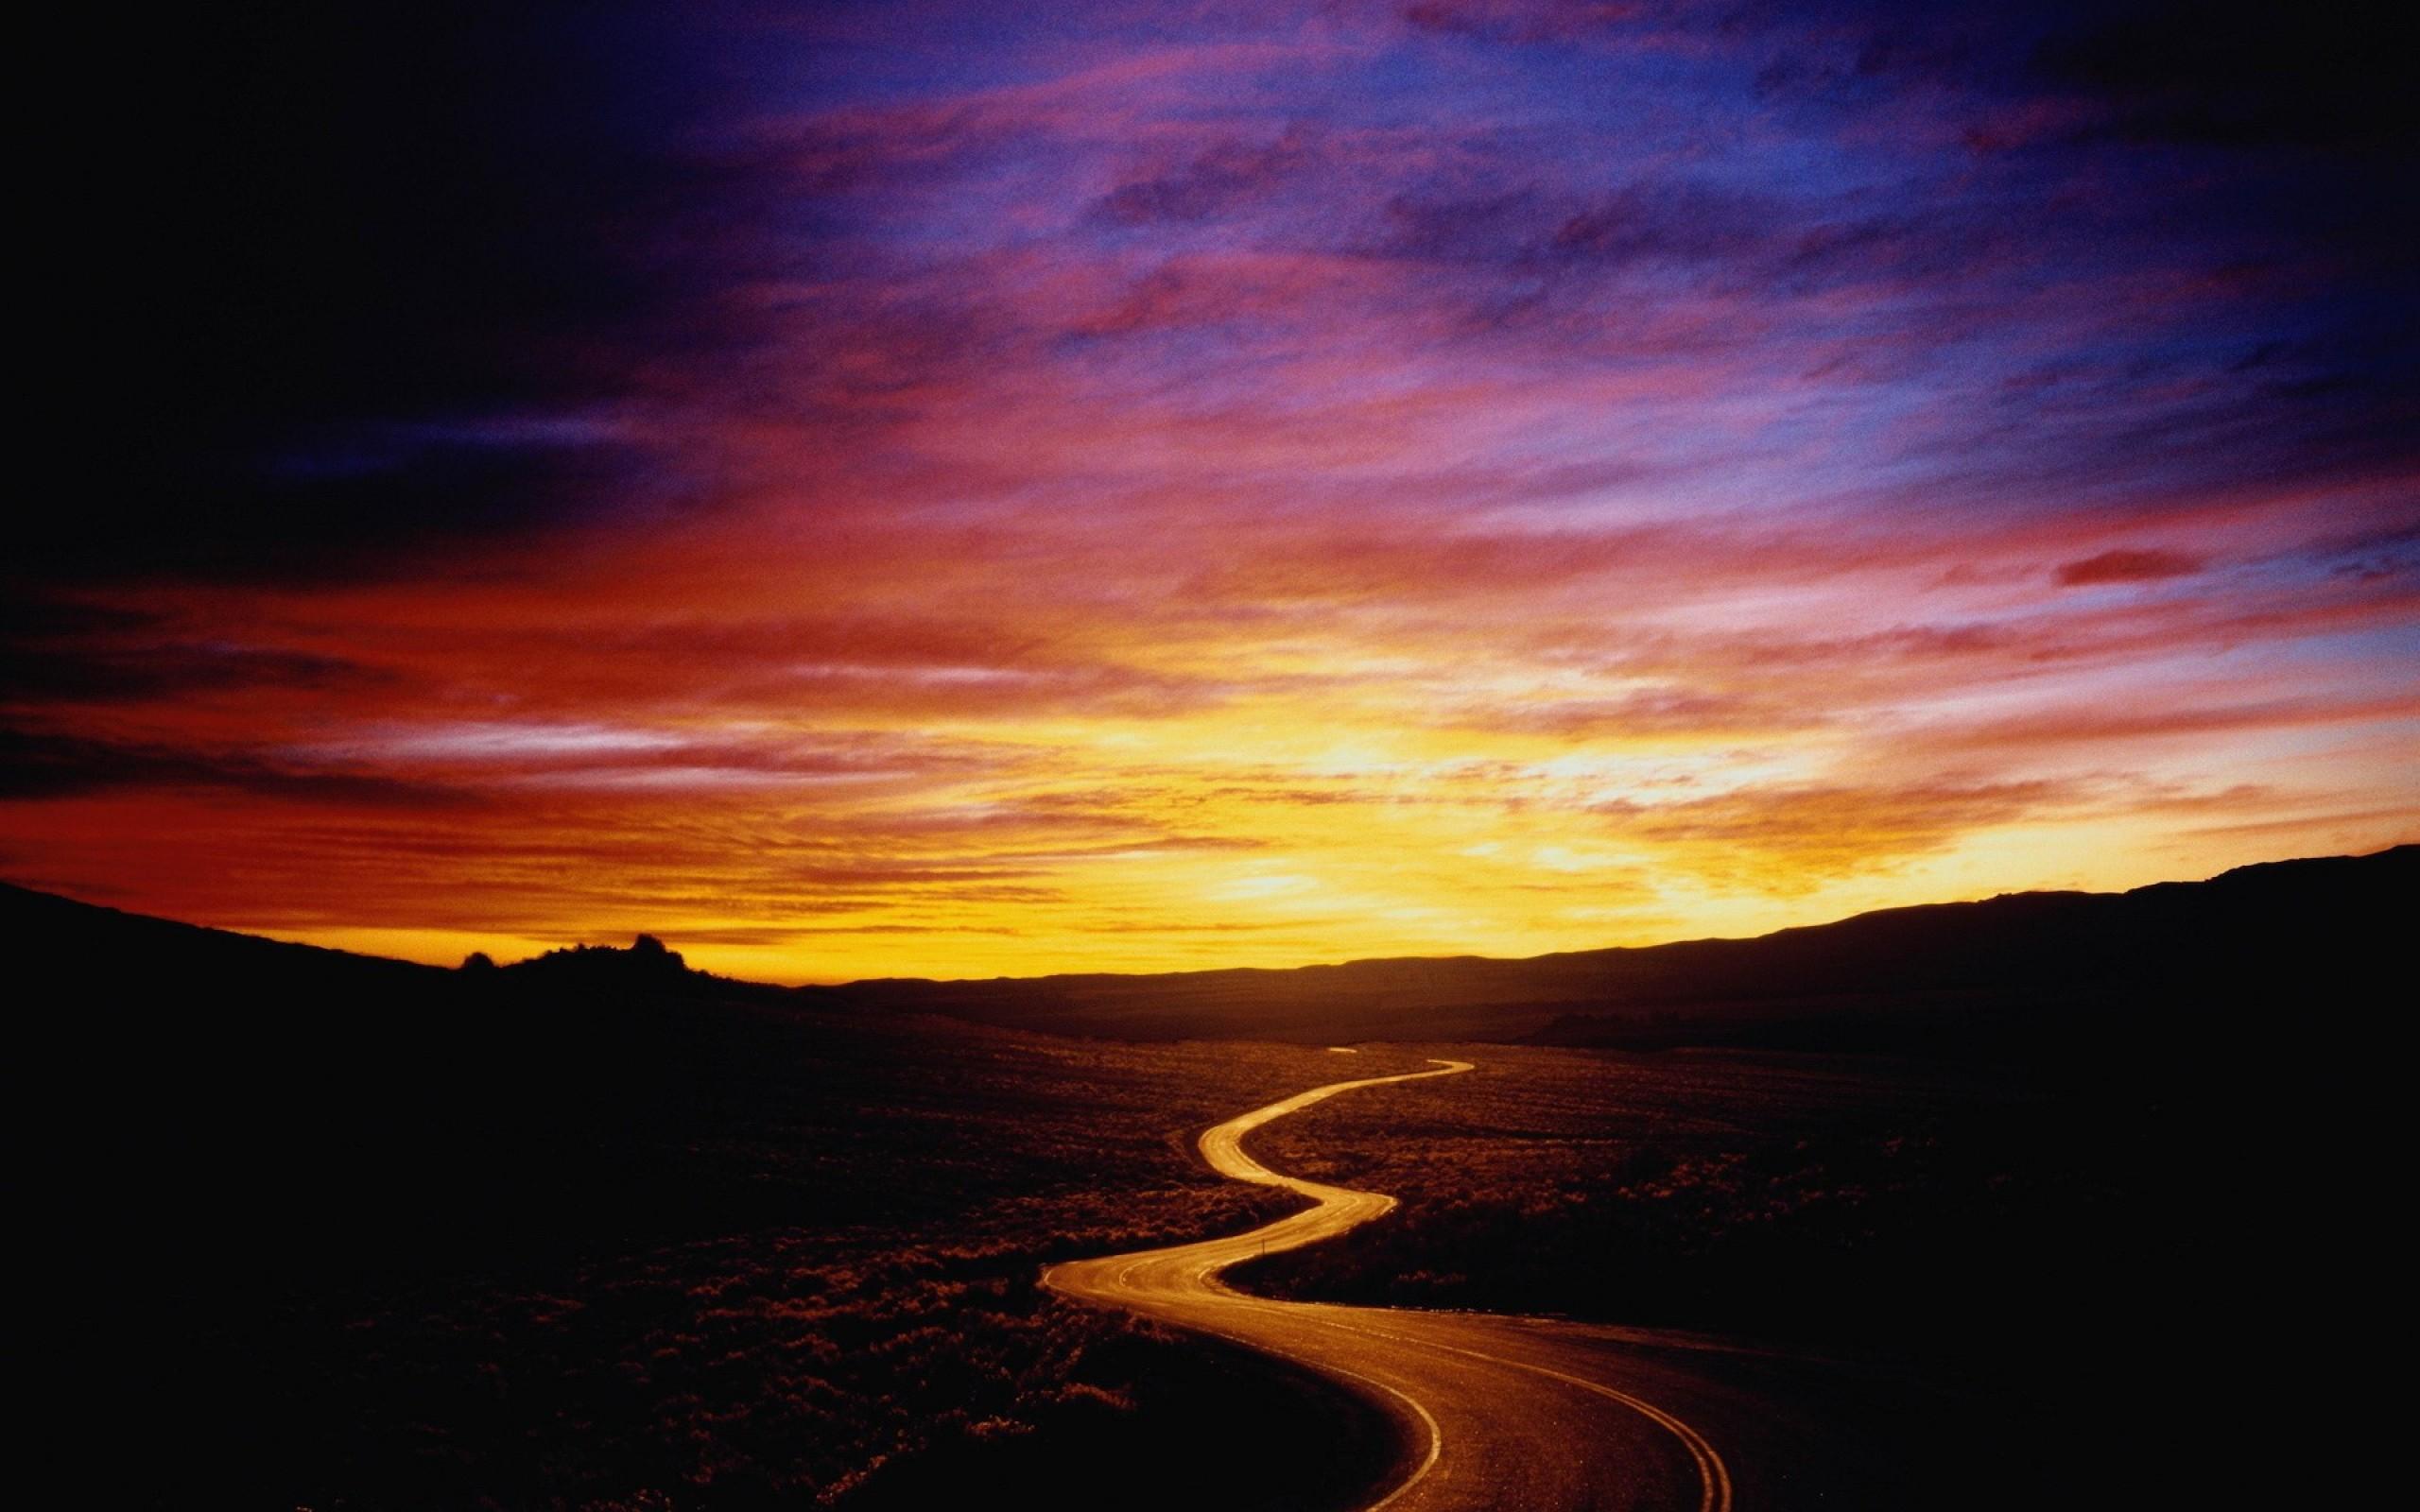 6965187-nature-road-sunset